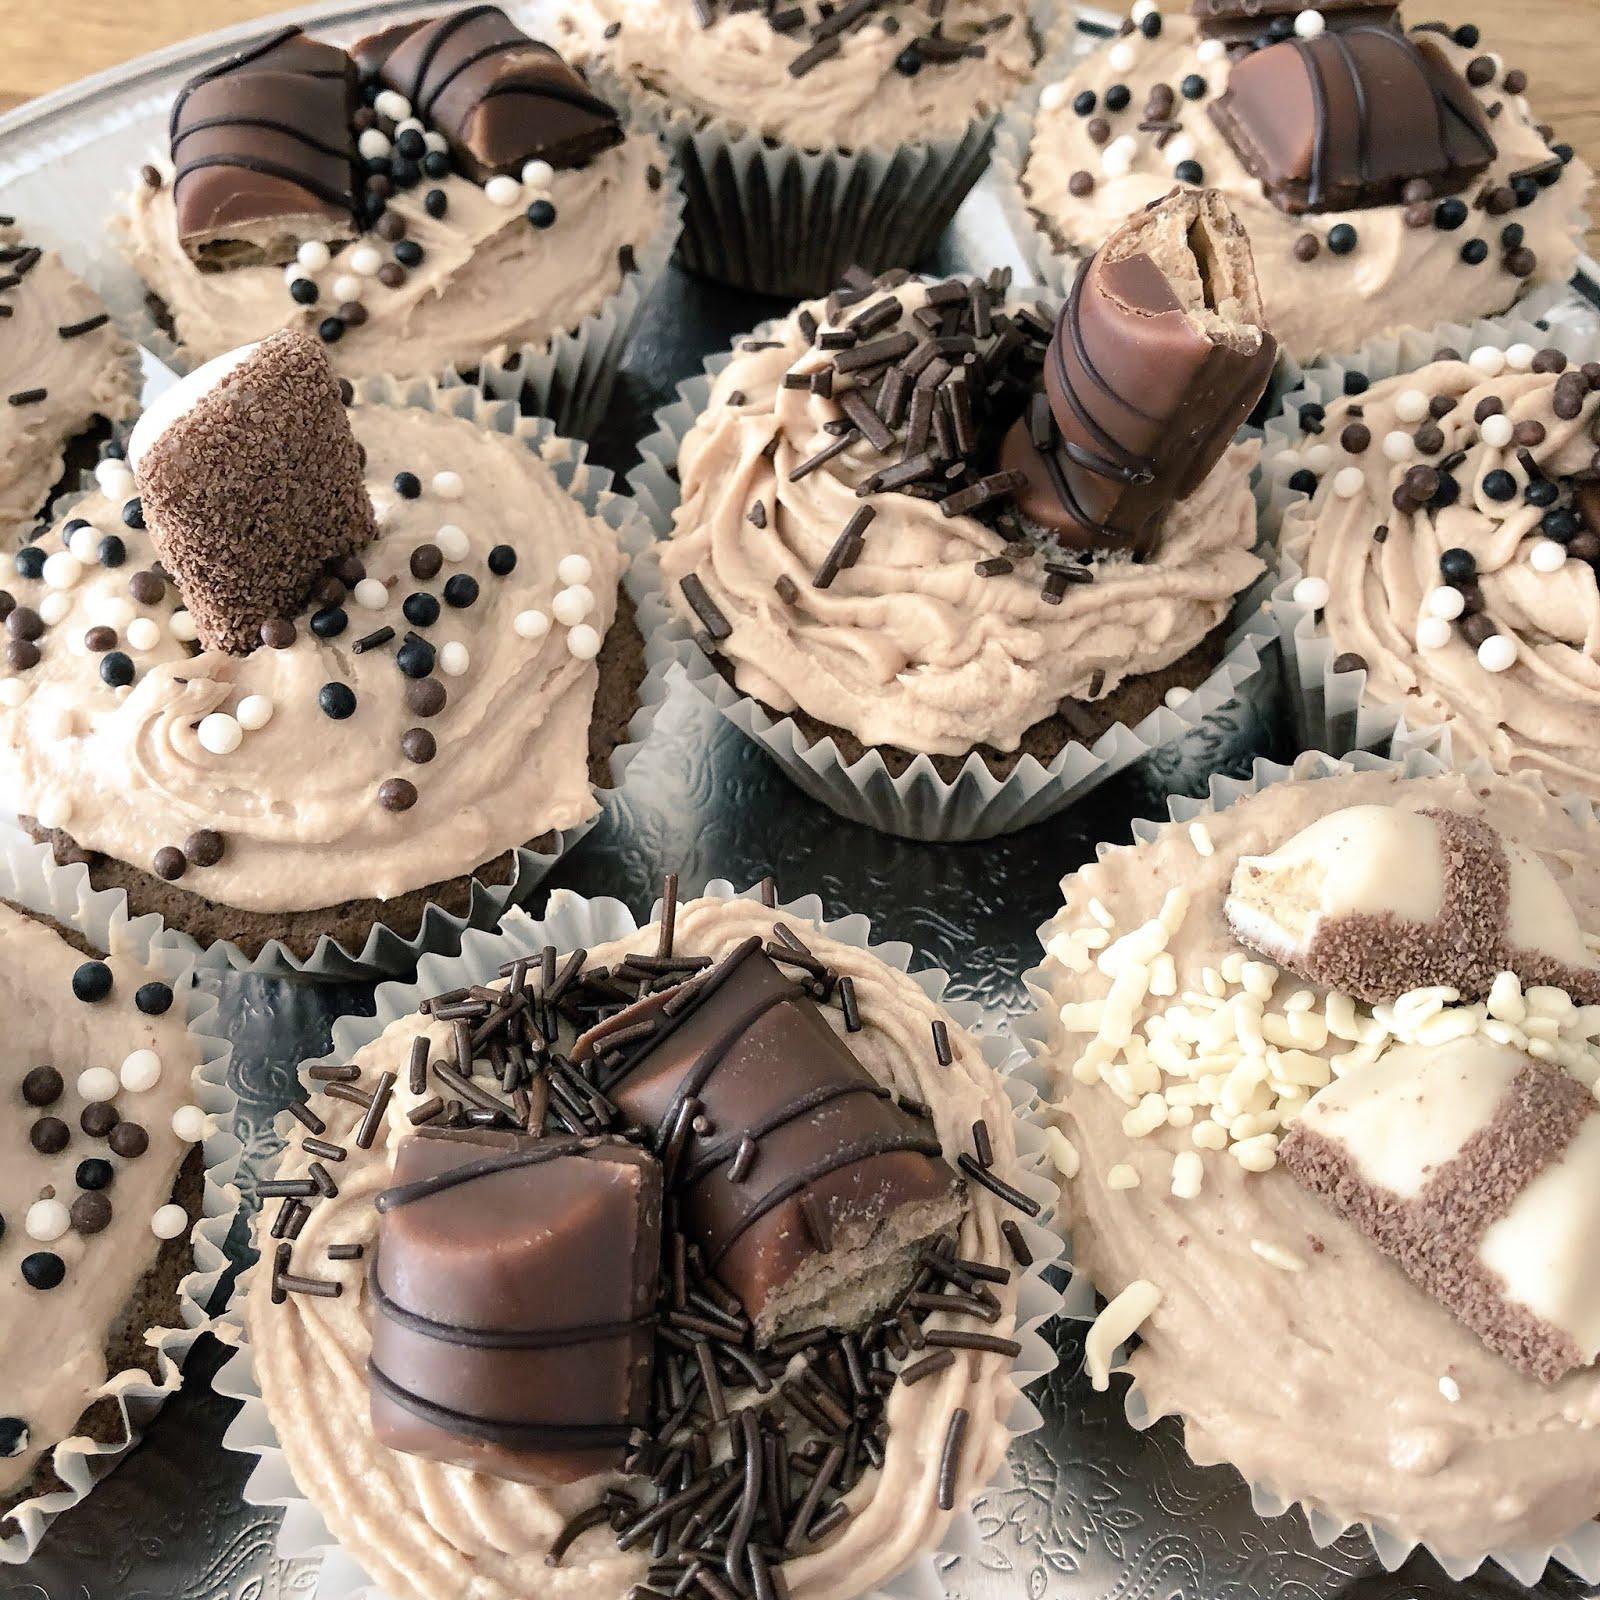 Kinder Bueno Cupcake Recipe